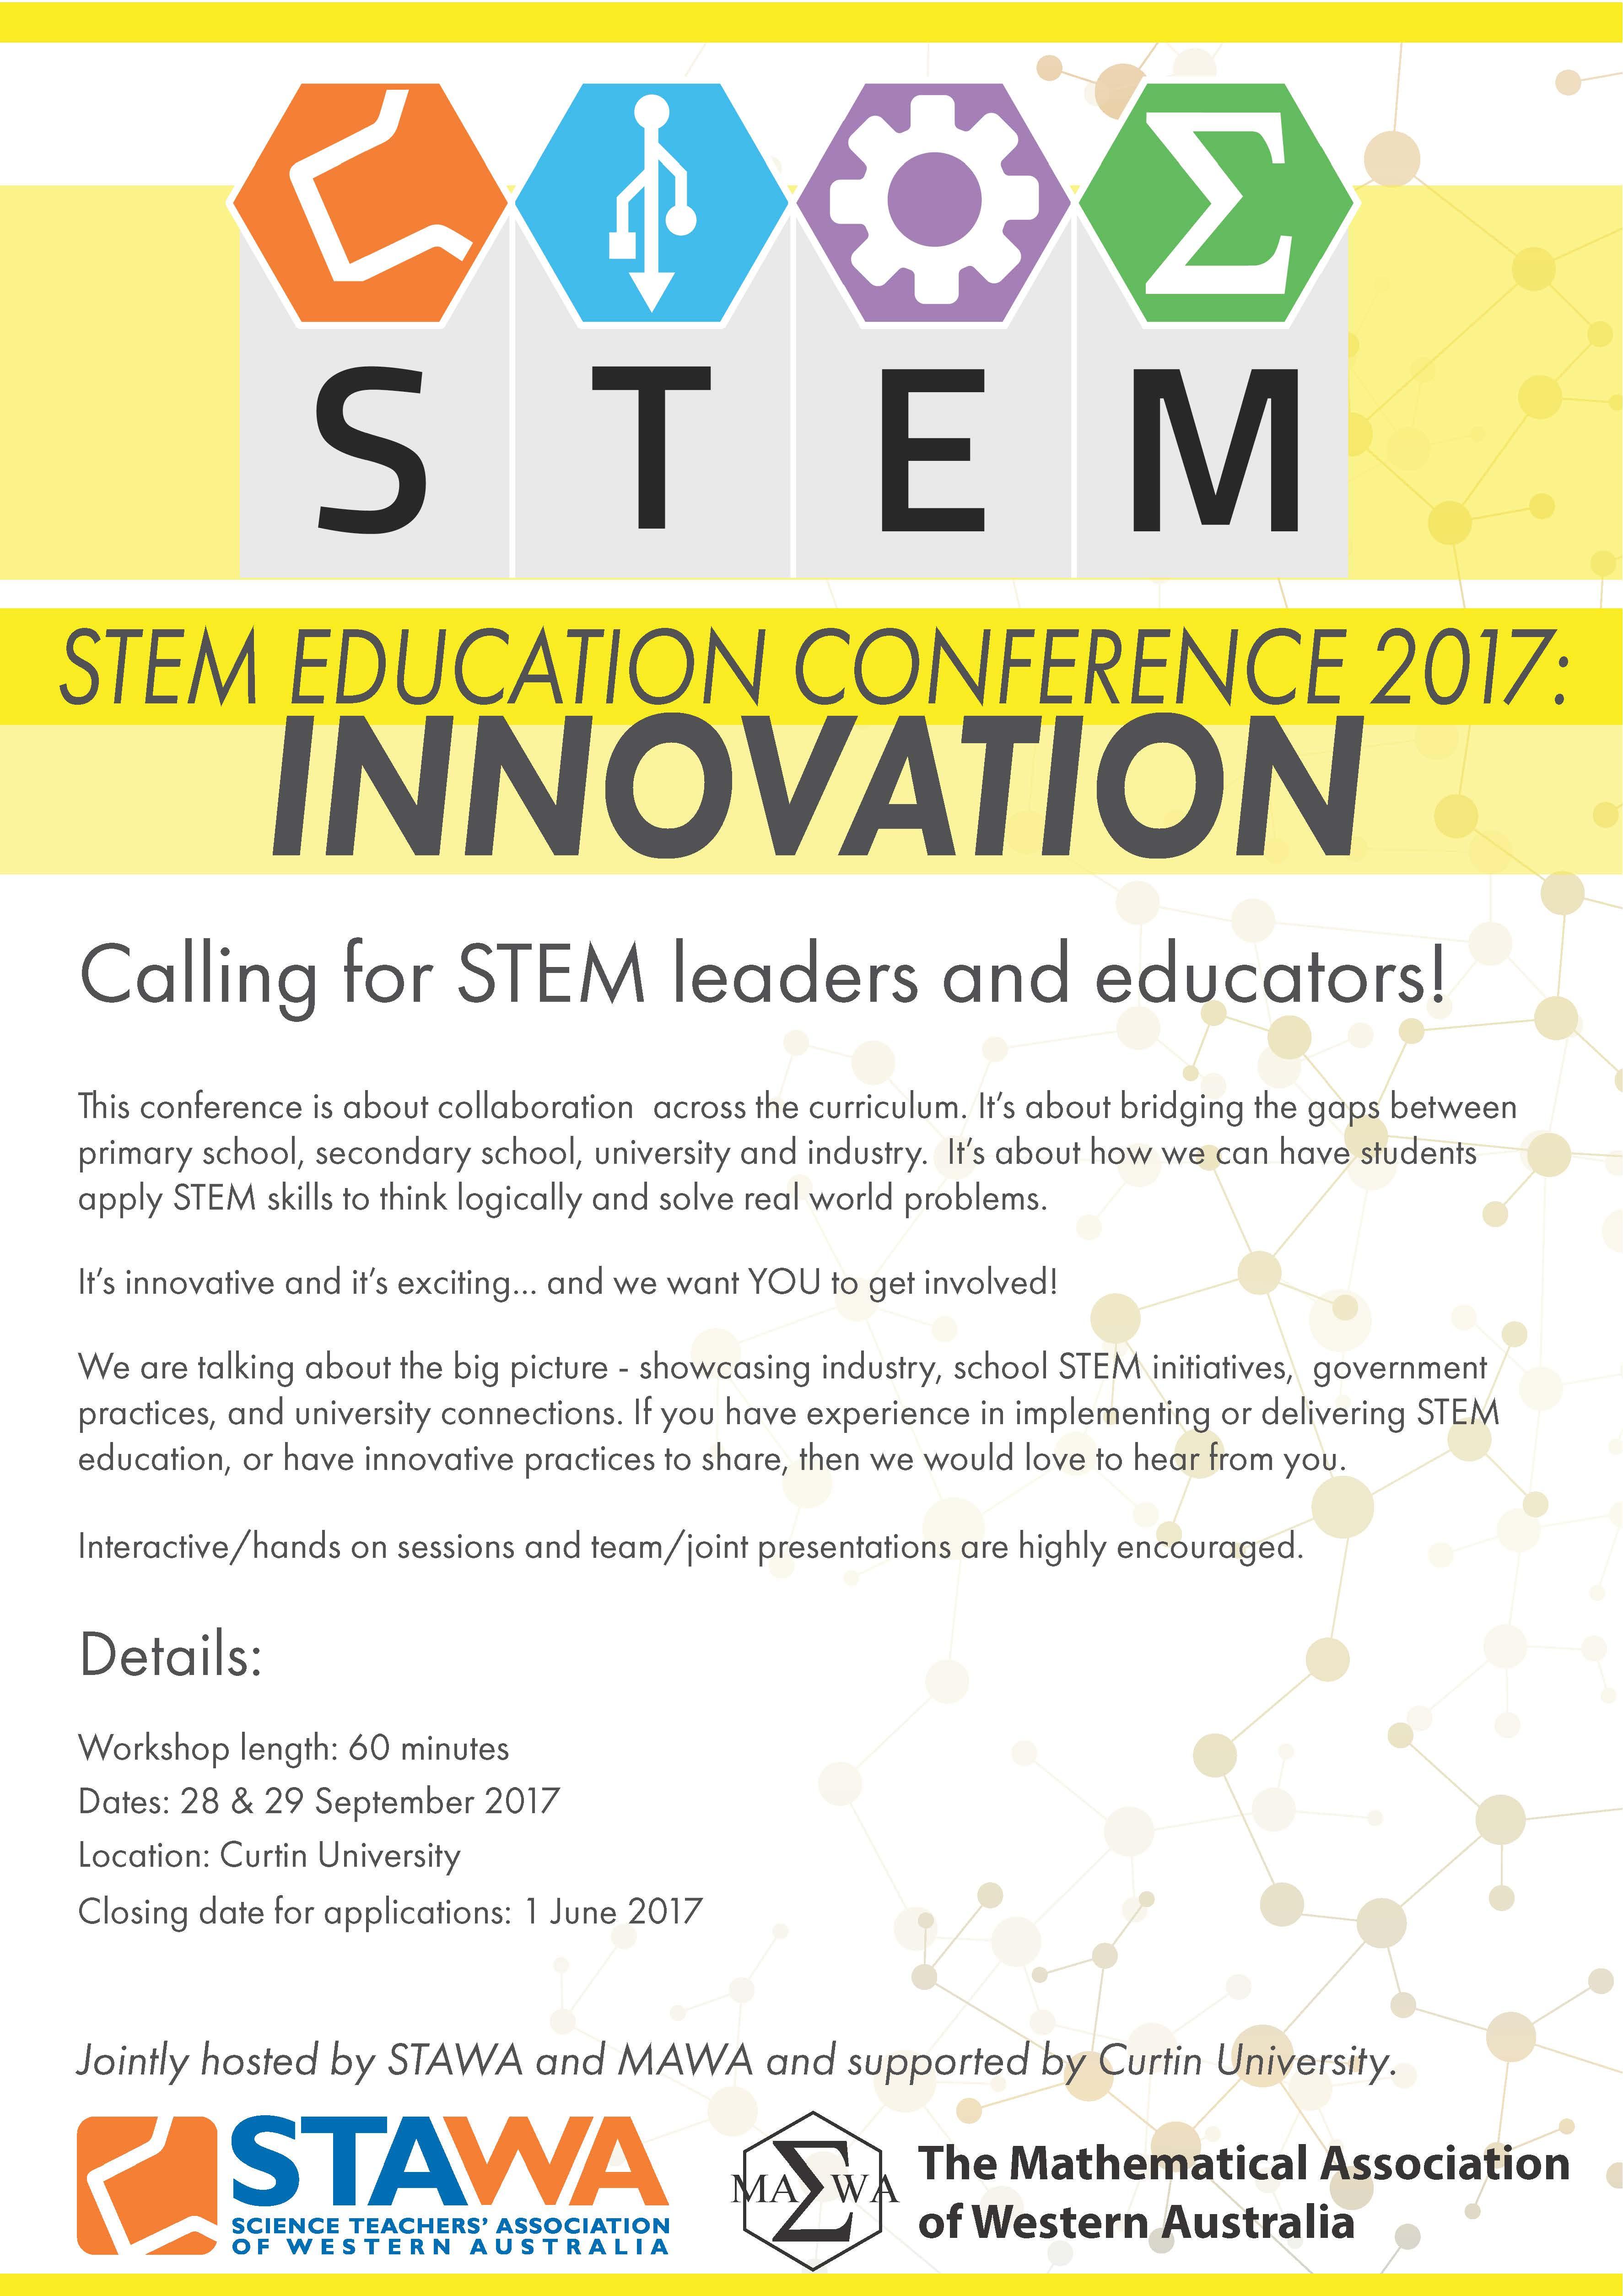 STEM Education Conference 2017: Innovation